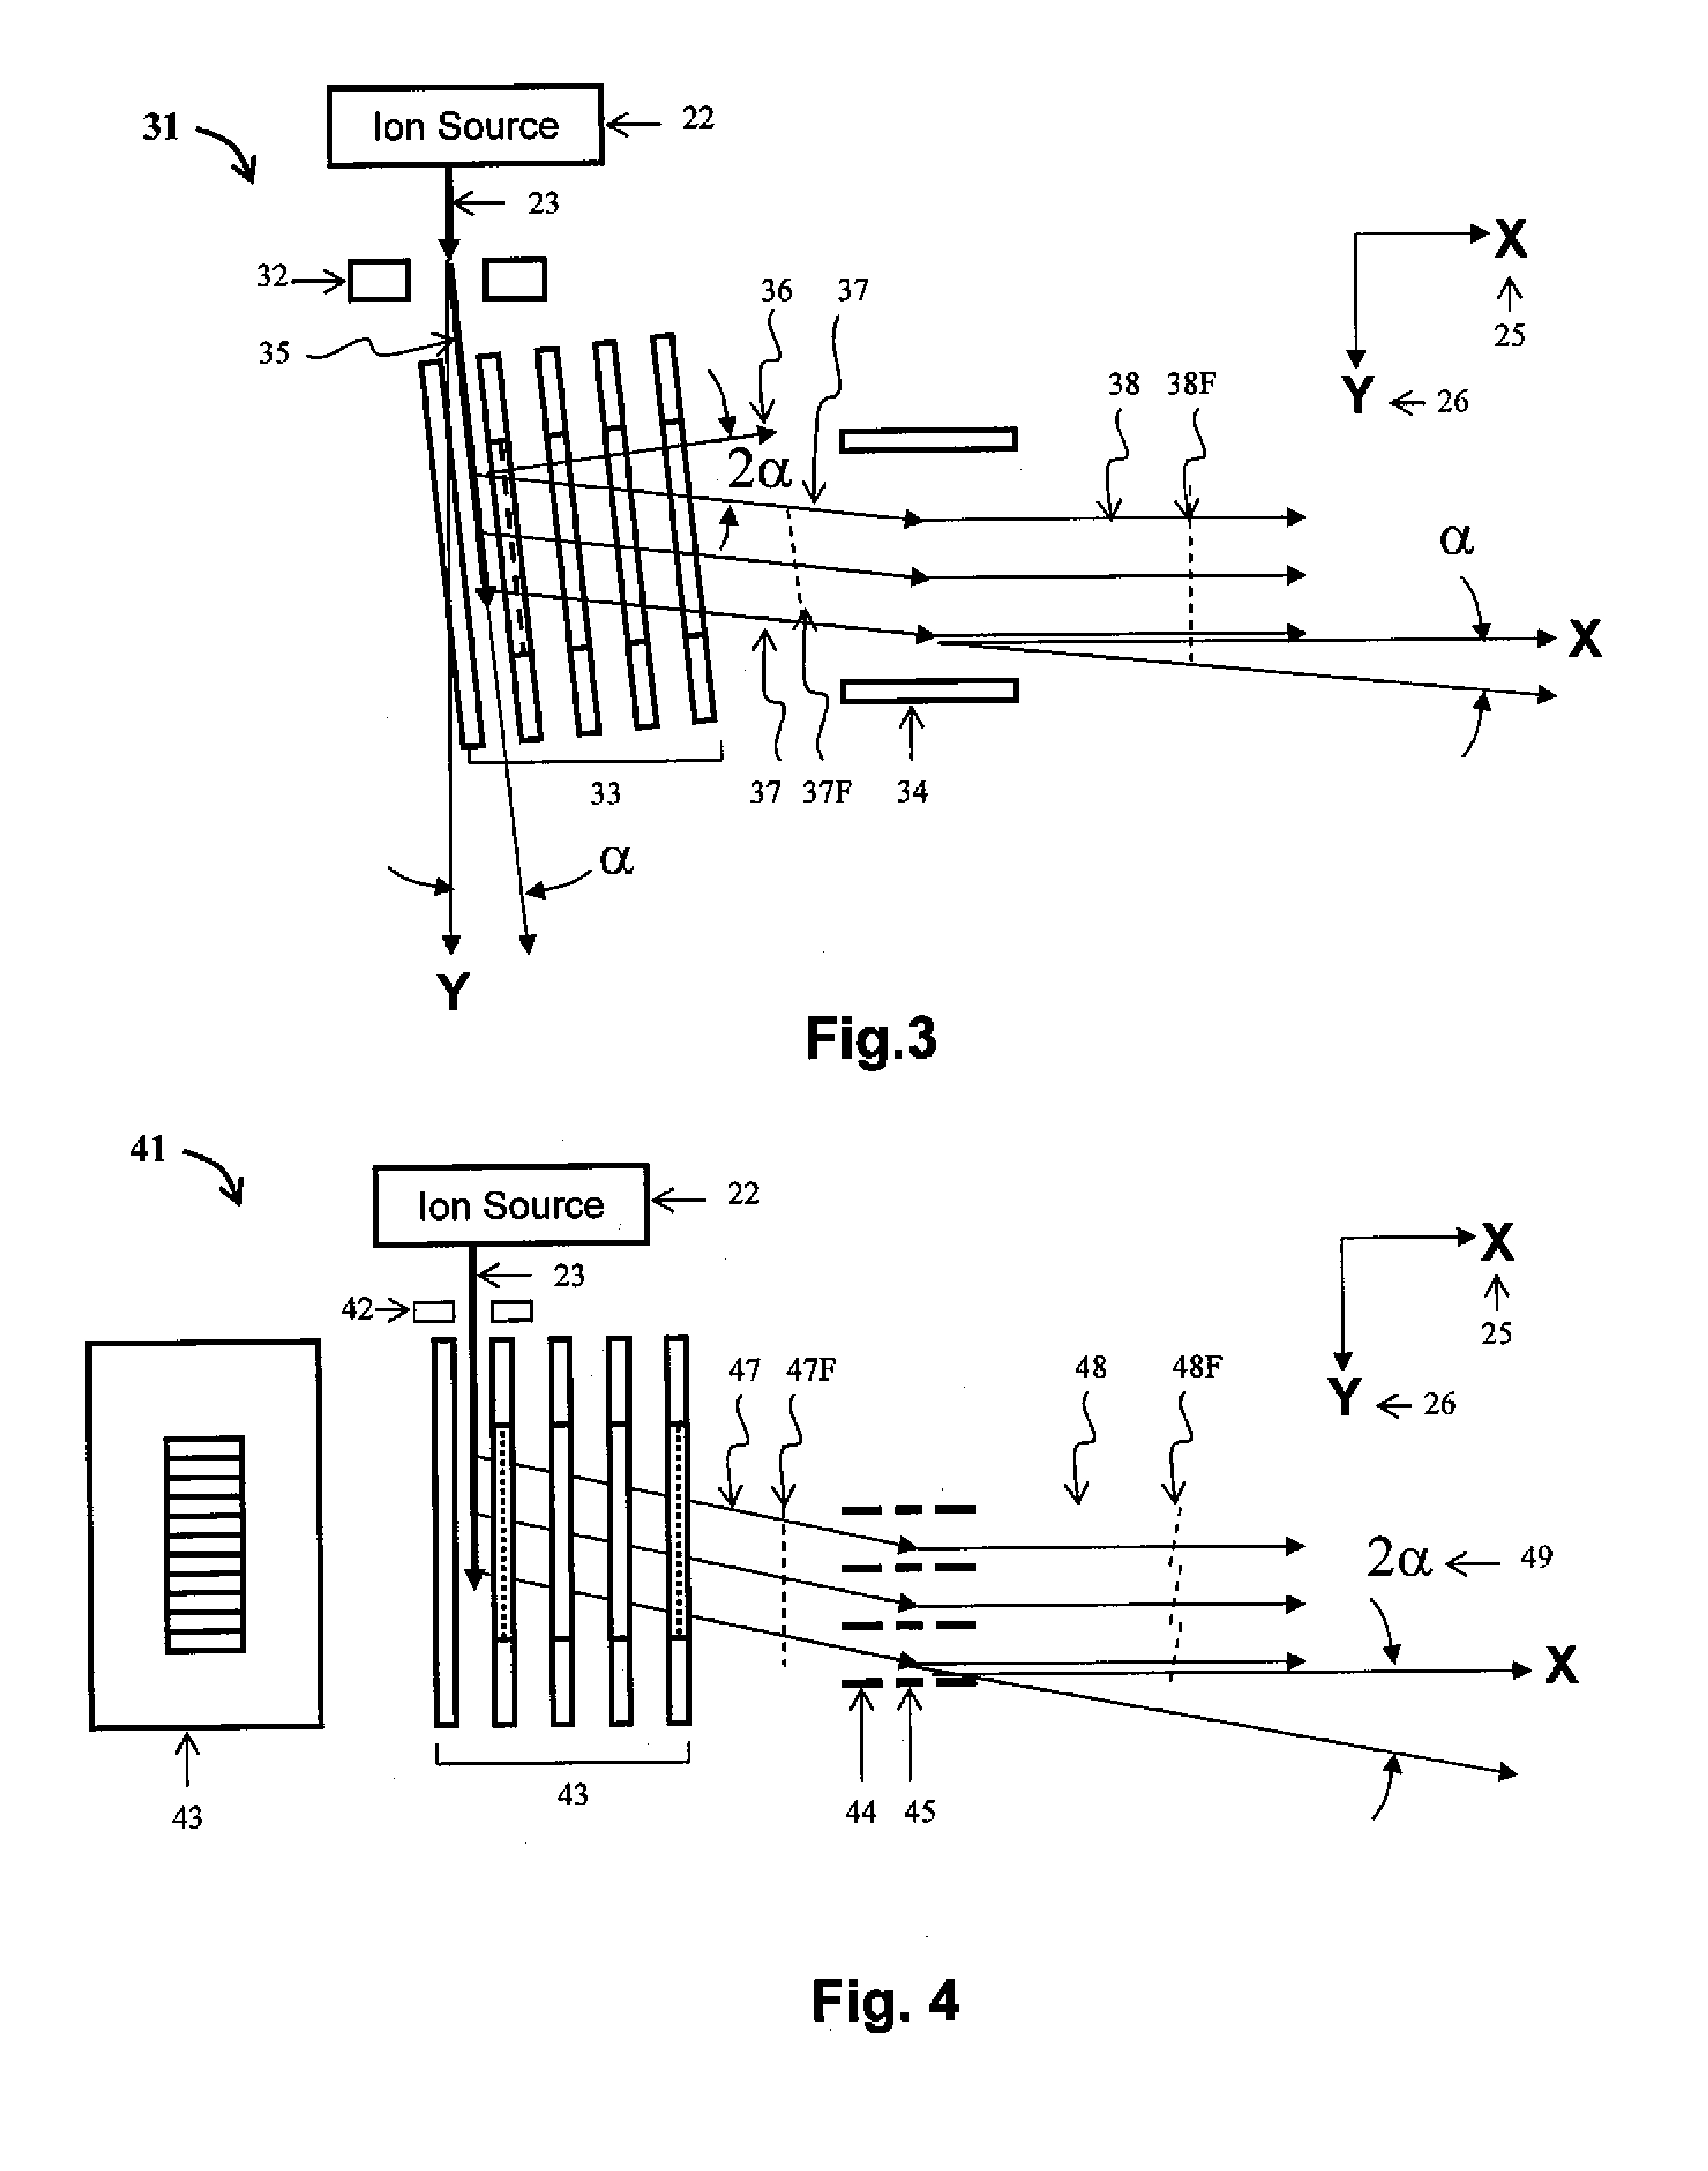 passtime pte 2 wiring diagram Collection-Passtime Gps Wiring Diagram 18-c